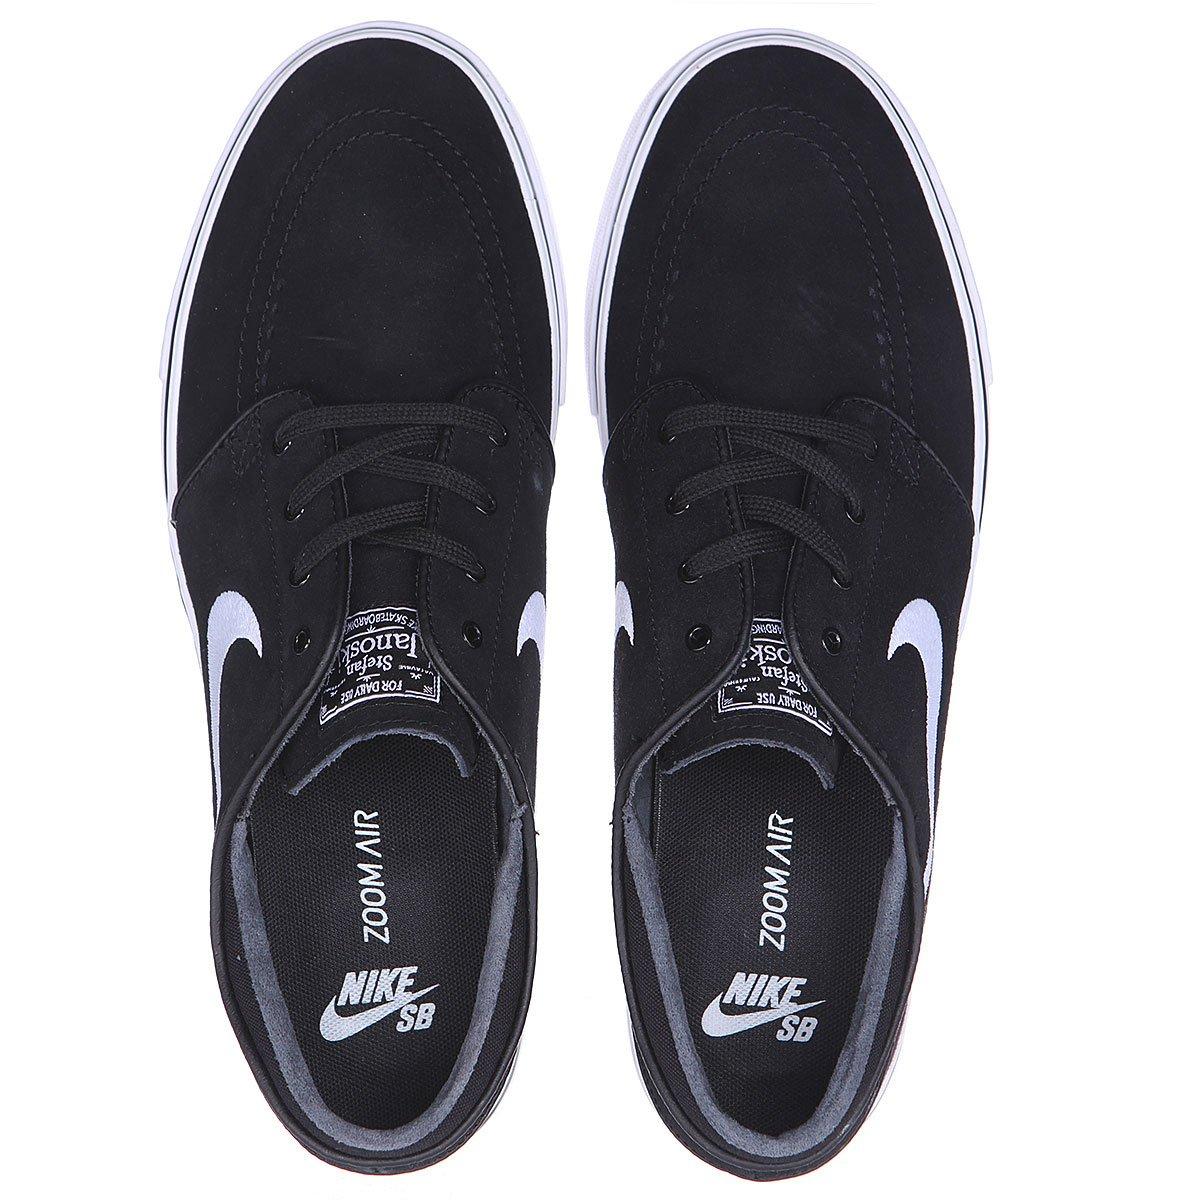 Купить кеды низкие Nike Zoom Stefan Janoski Black White (333824-026 ... 08d3203b9e5